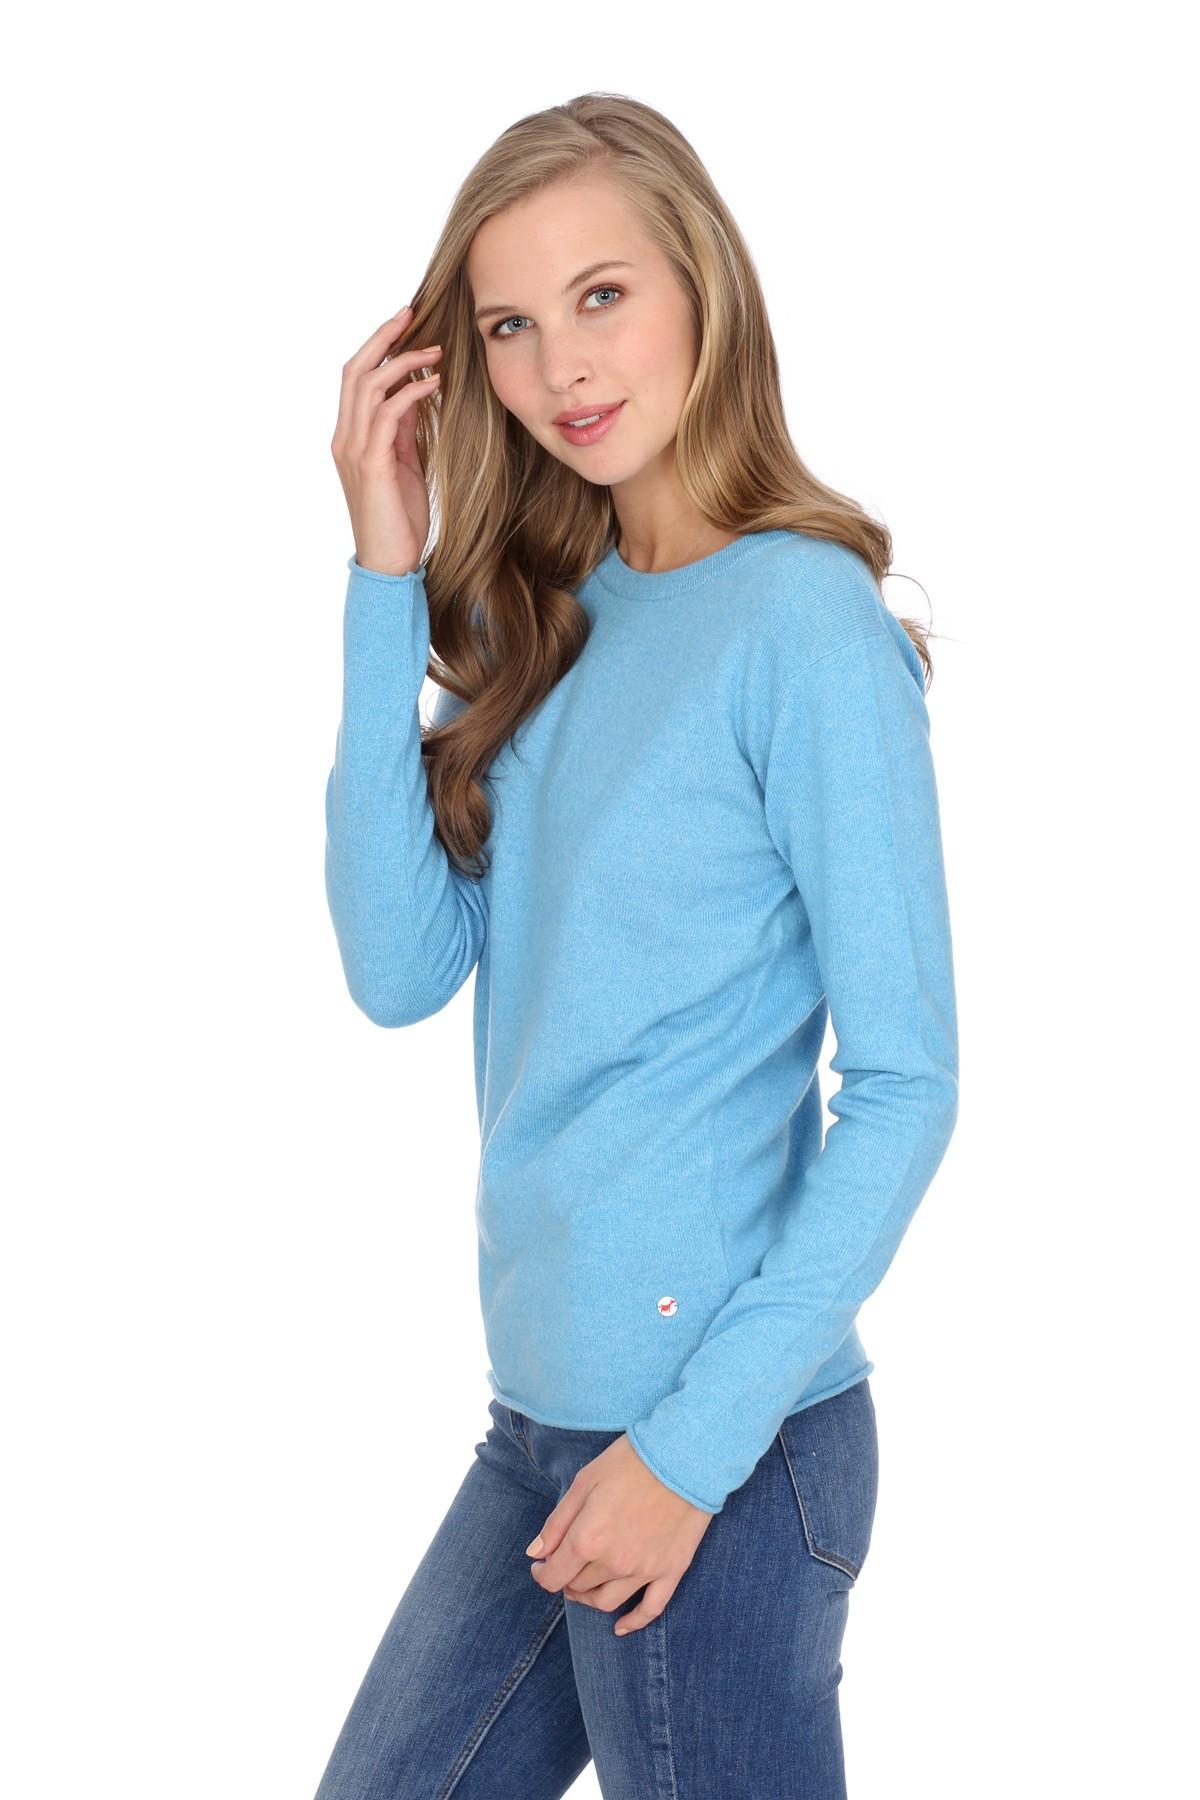 kaschmirpullover longsleeve air blue damen pullover. Black Bedroom Furniture Sets. Home Design Ideas